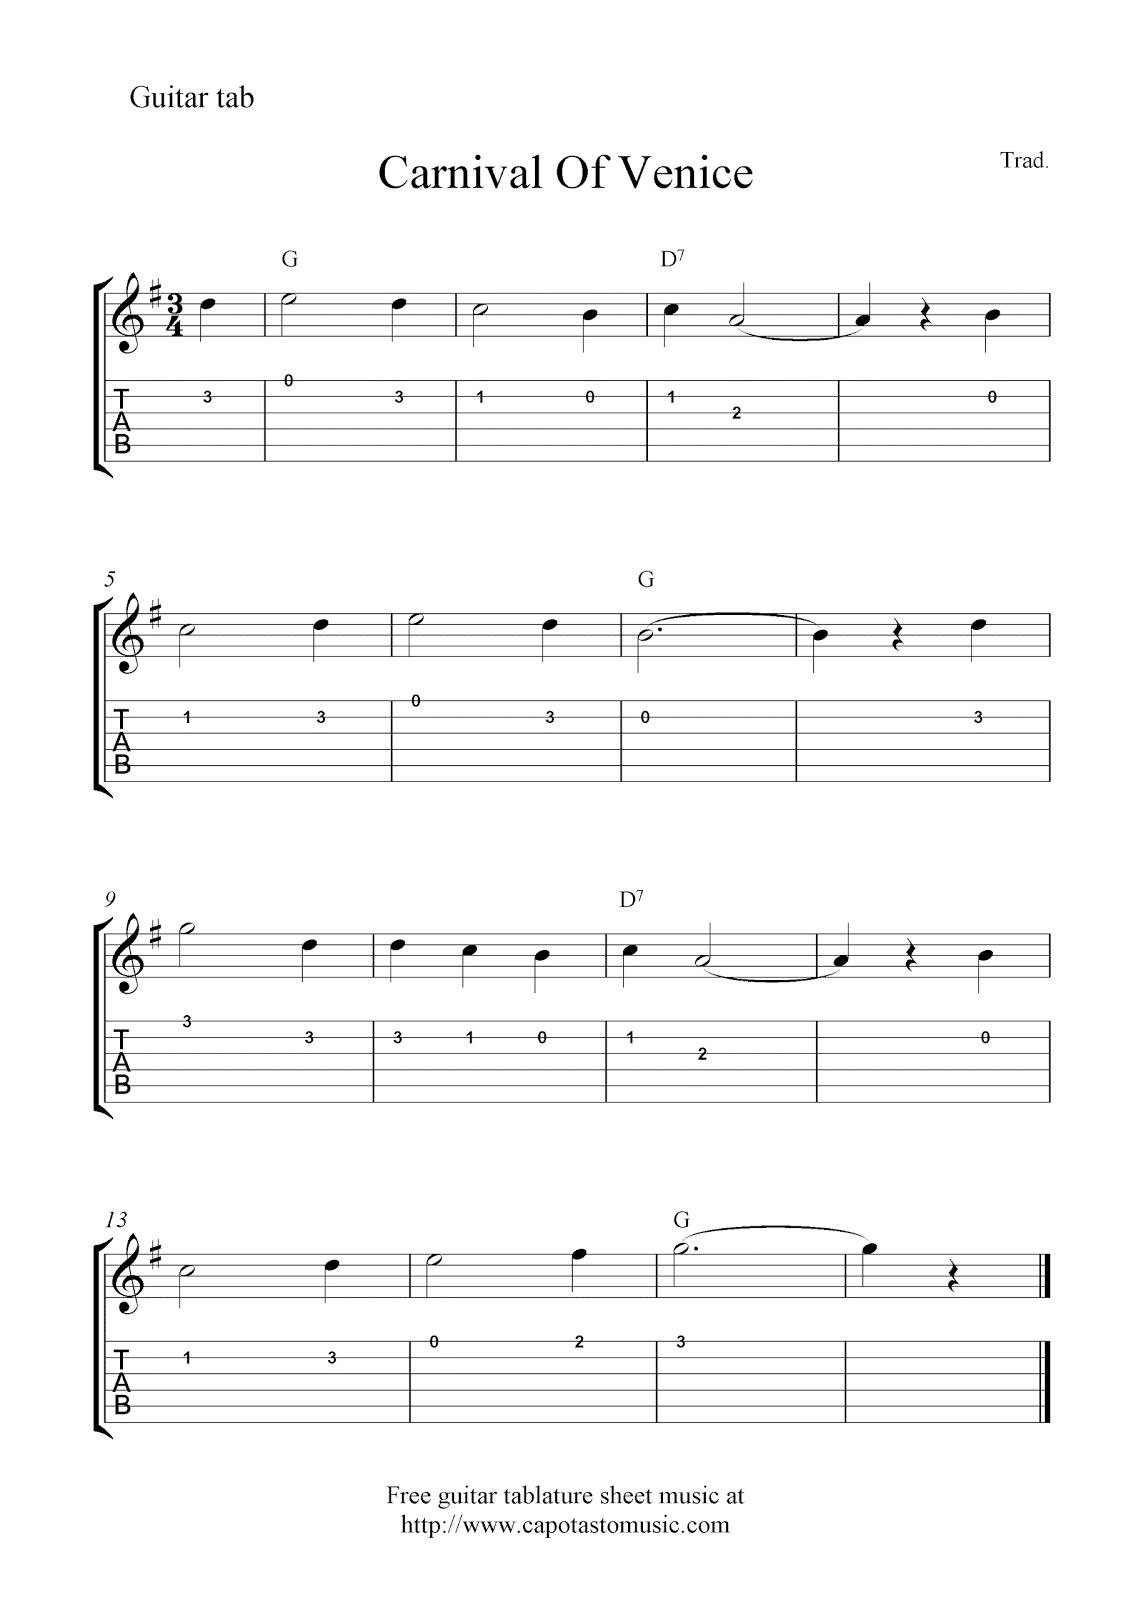 Free Guitar Tablature Sheet Music Carnival Of Venice